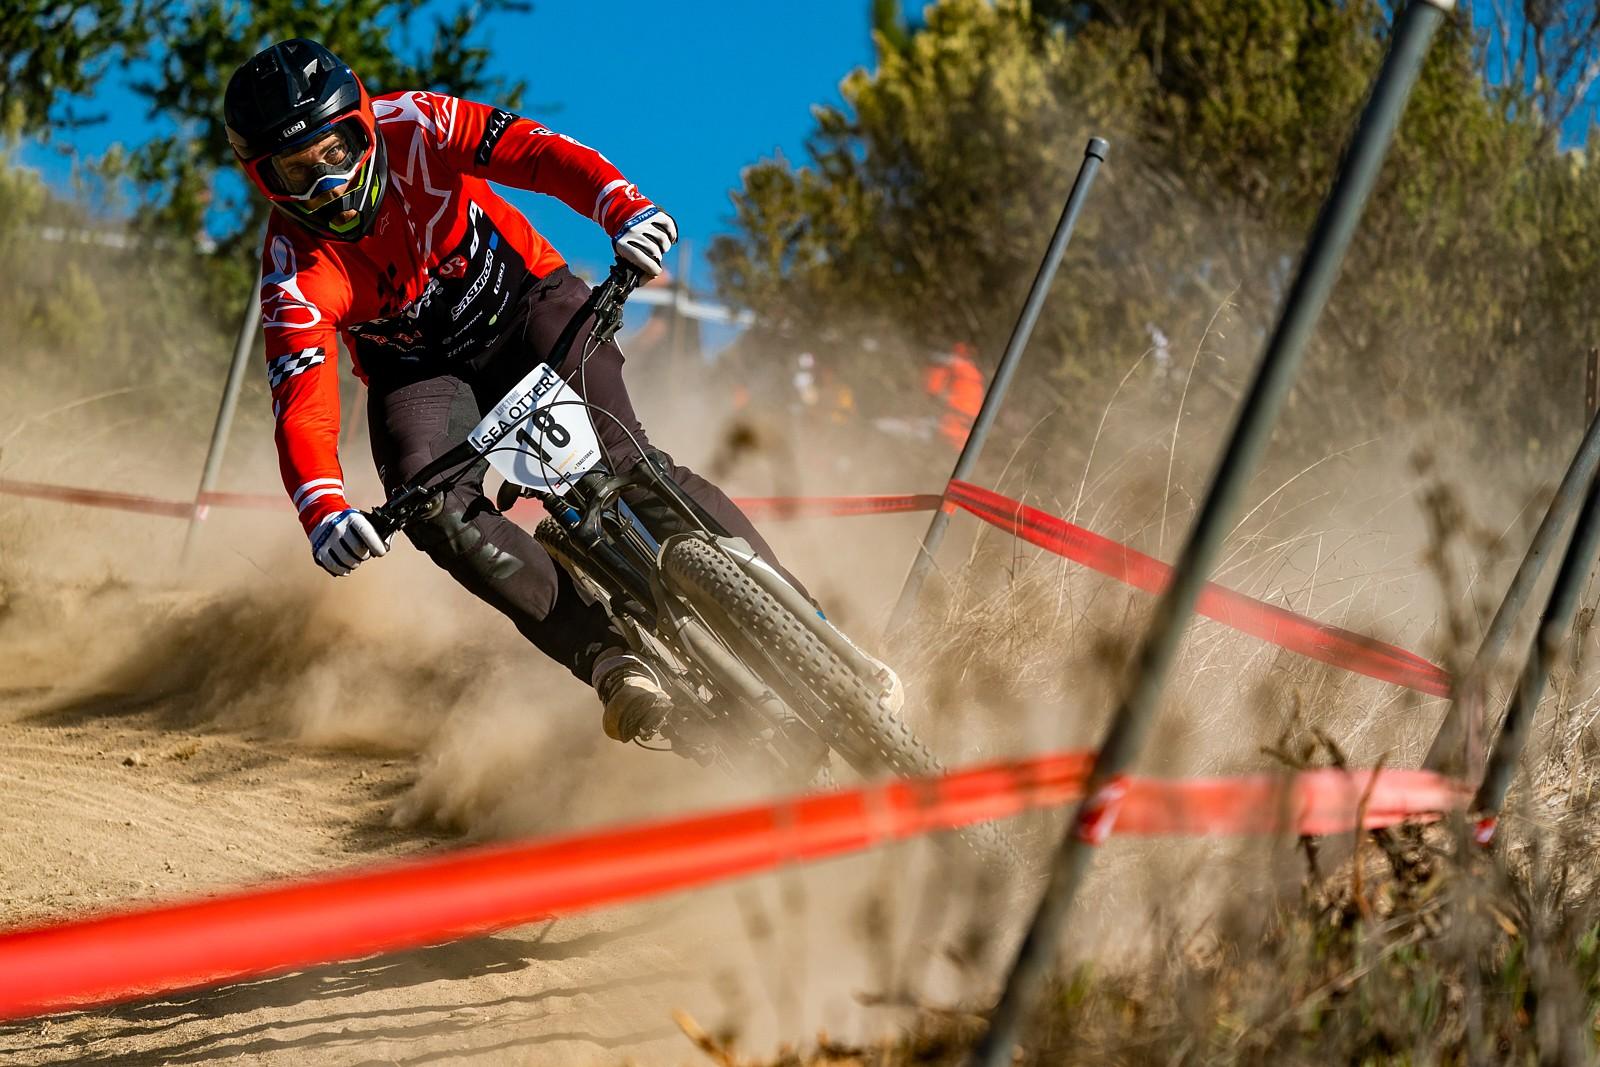 Mick Hannah - Zuestman - Mountain Biking Pictures - Vital MTB